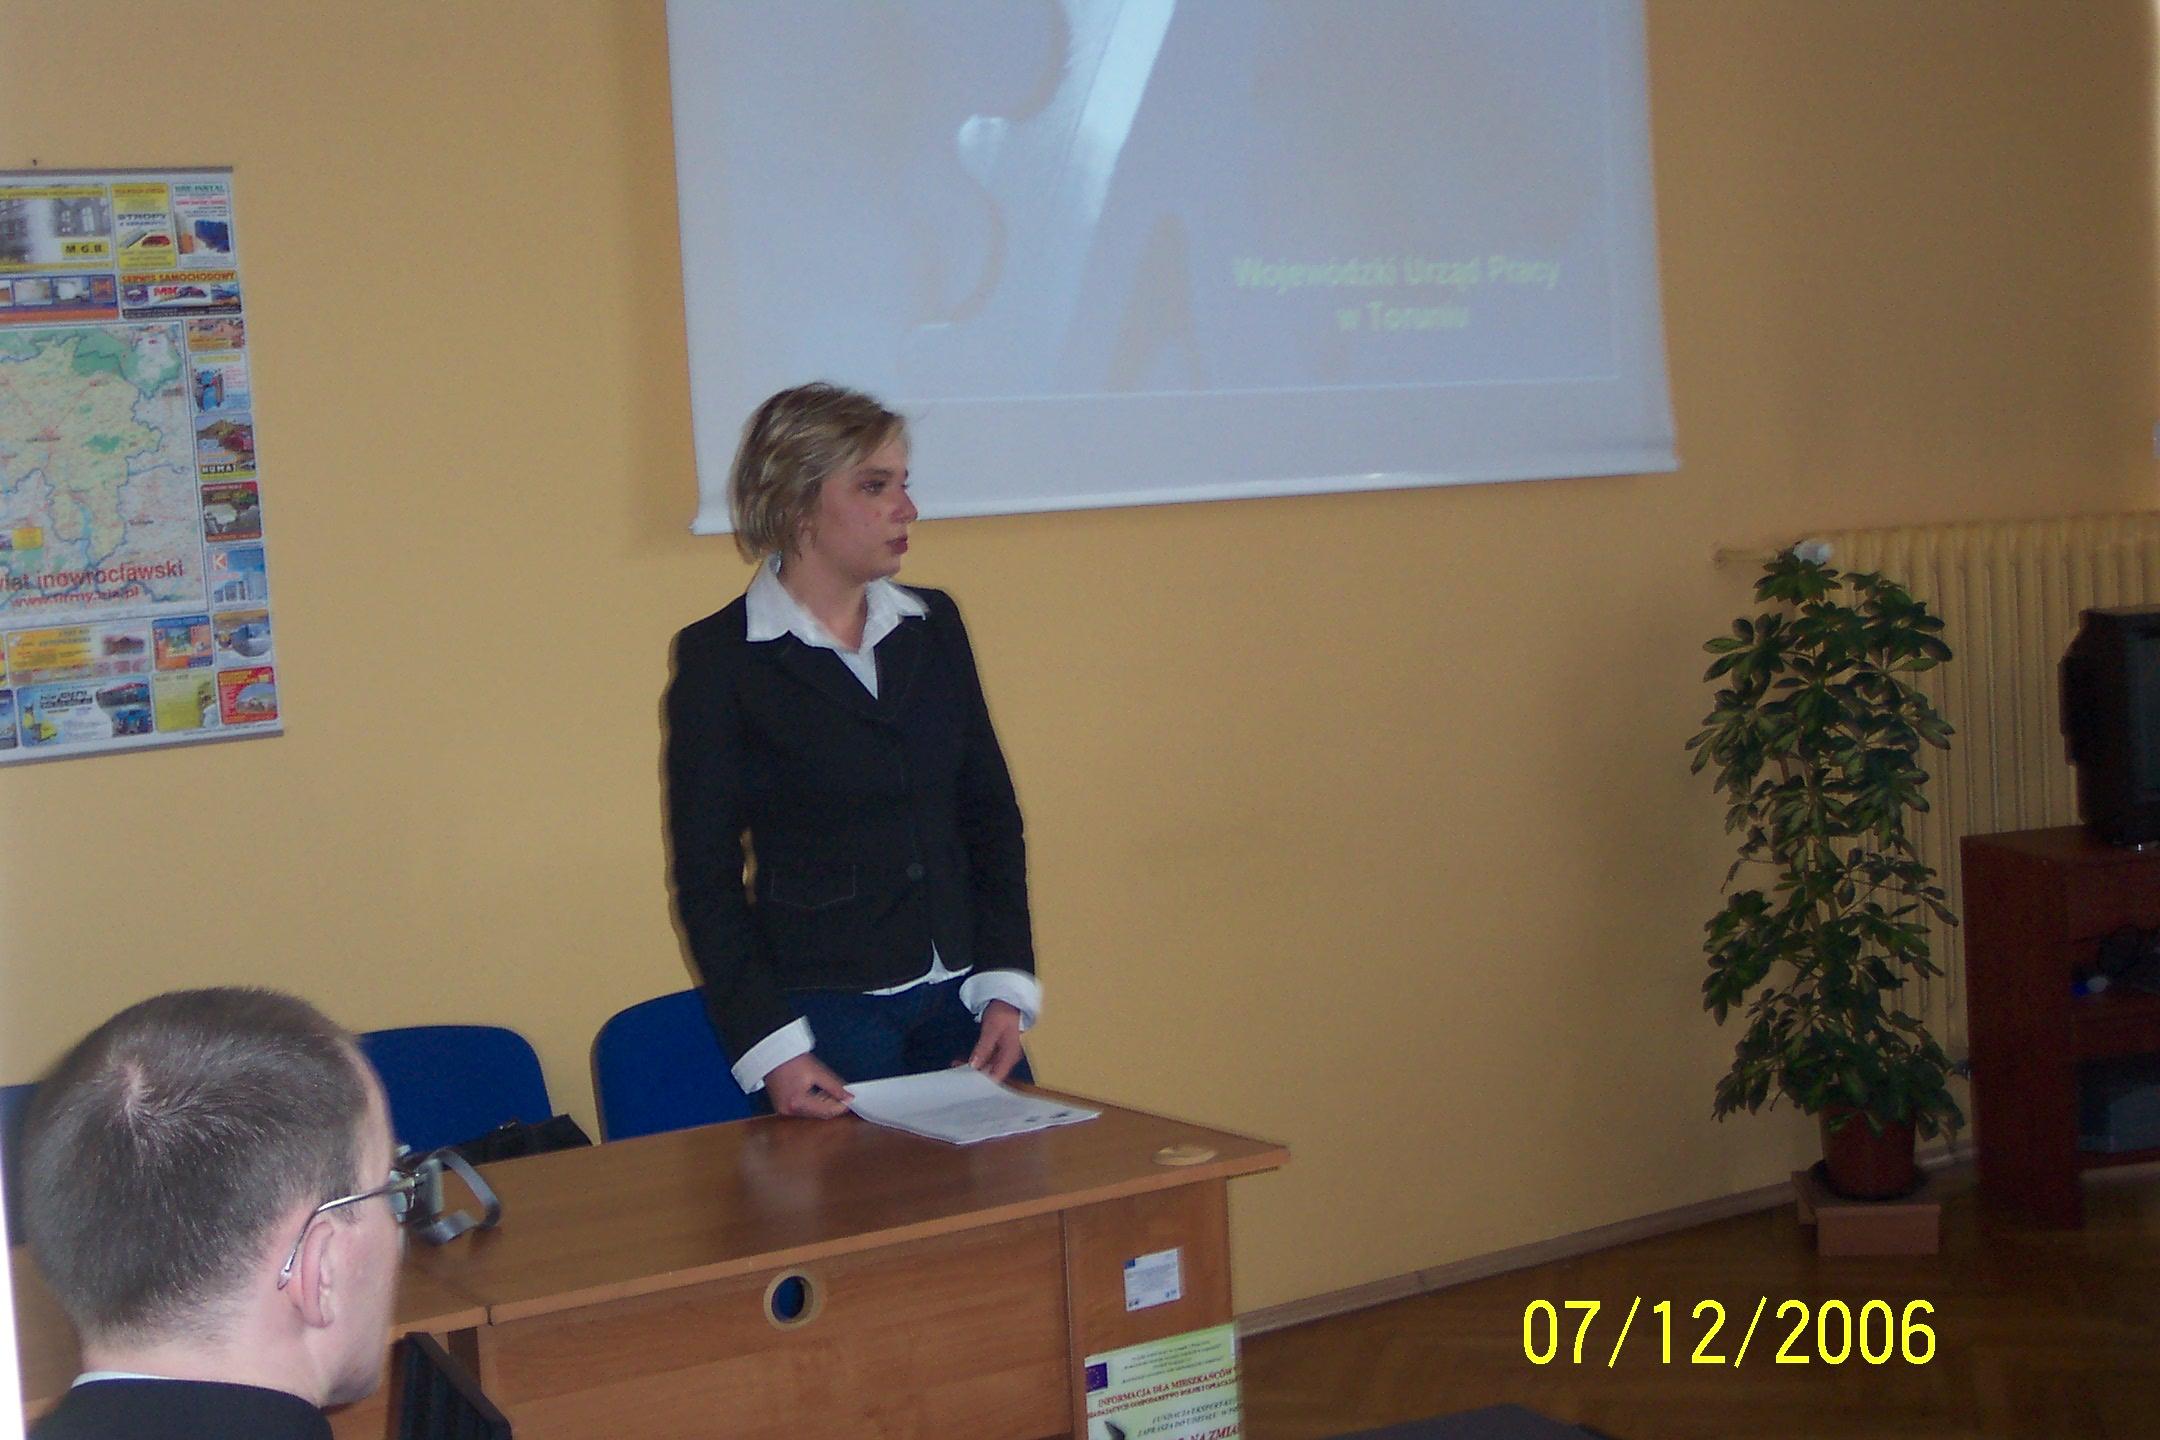 konferencja_06.12.2006_005